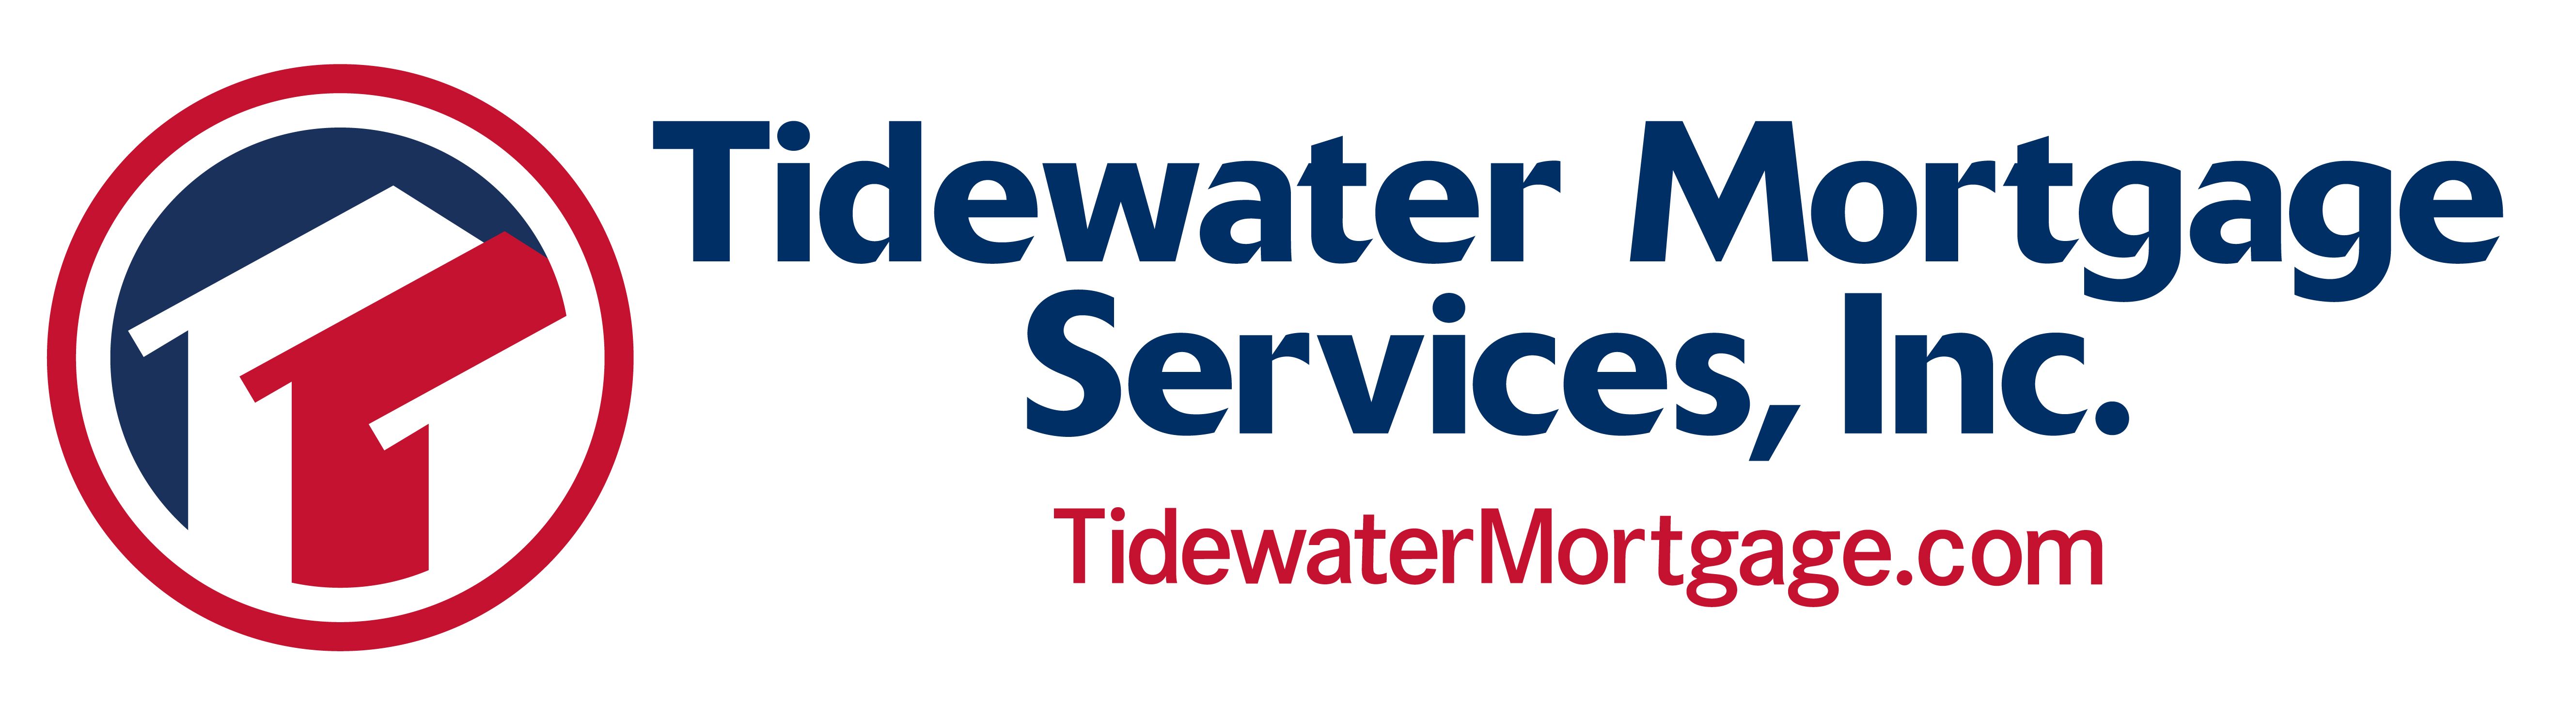 Tidewater Mortgage Services Company Logo